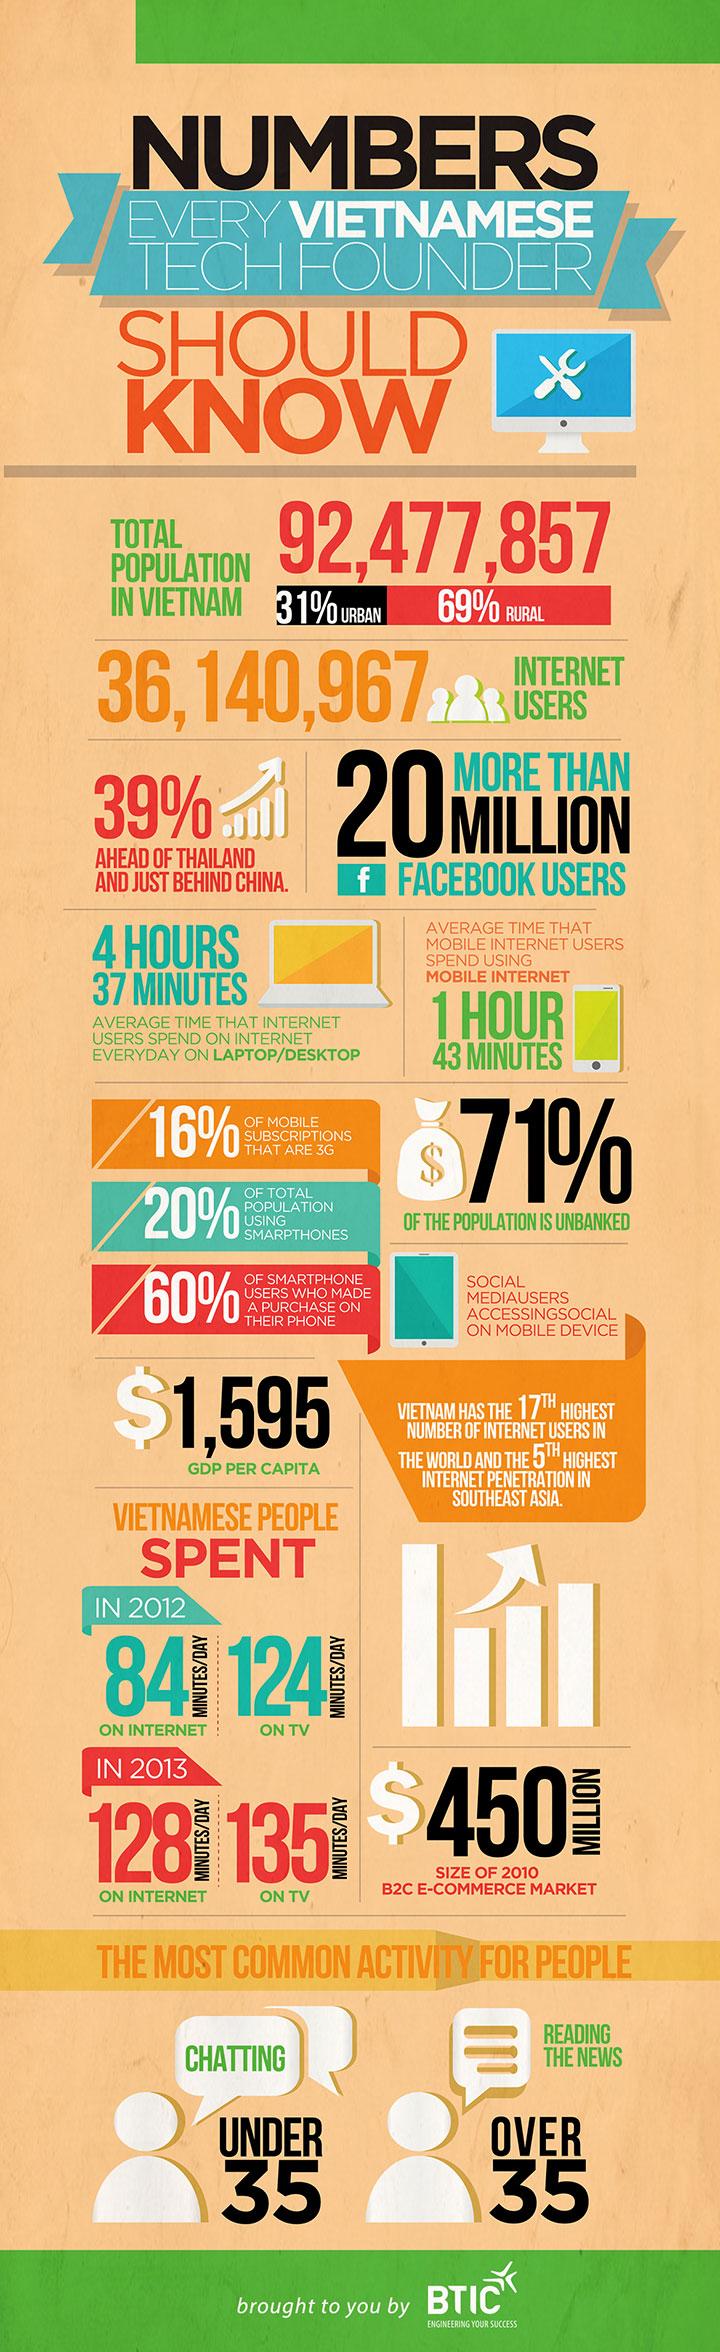 tech-founder-vietnam-infographic